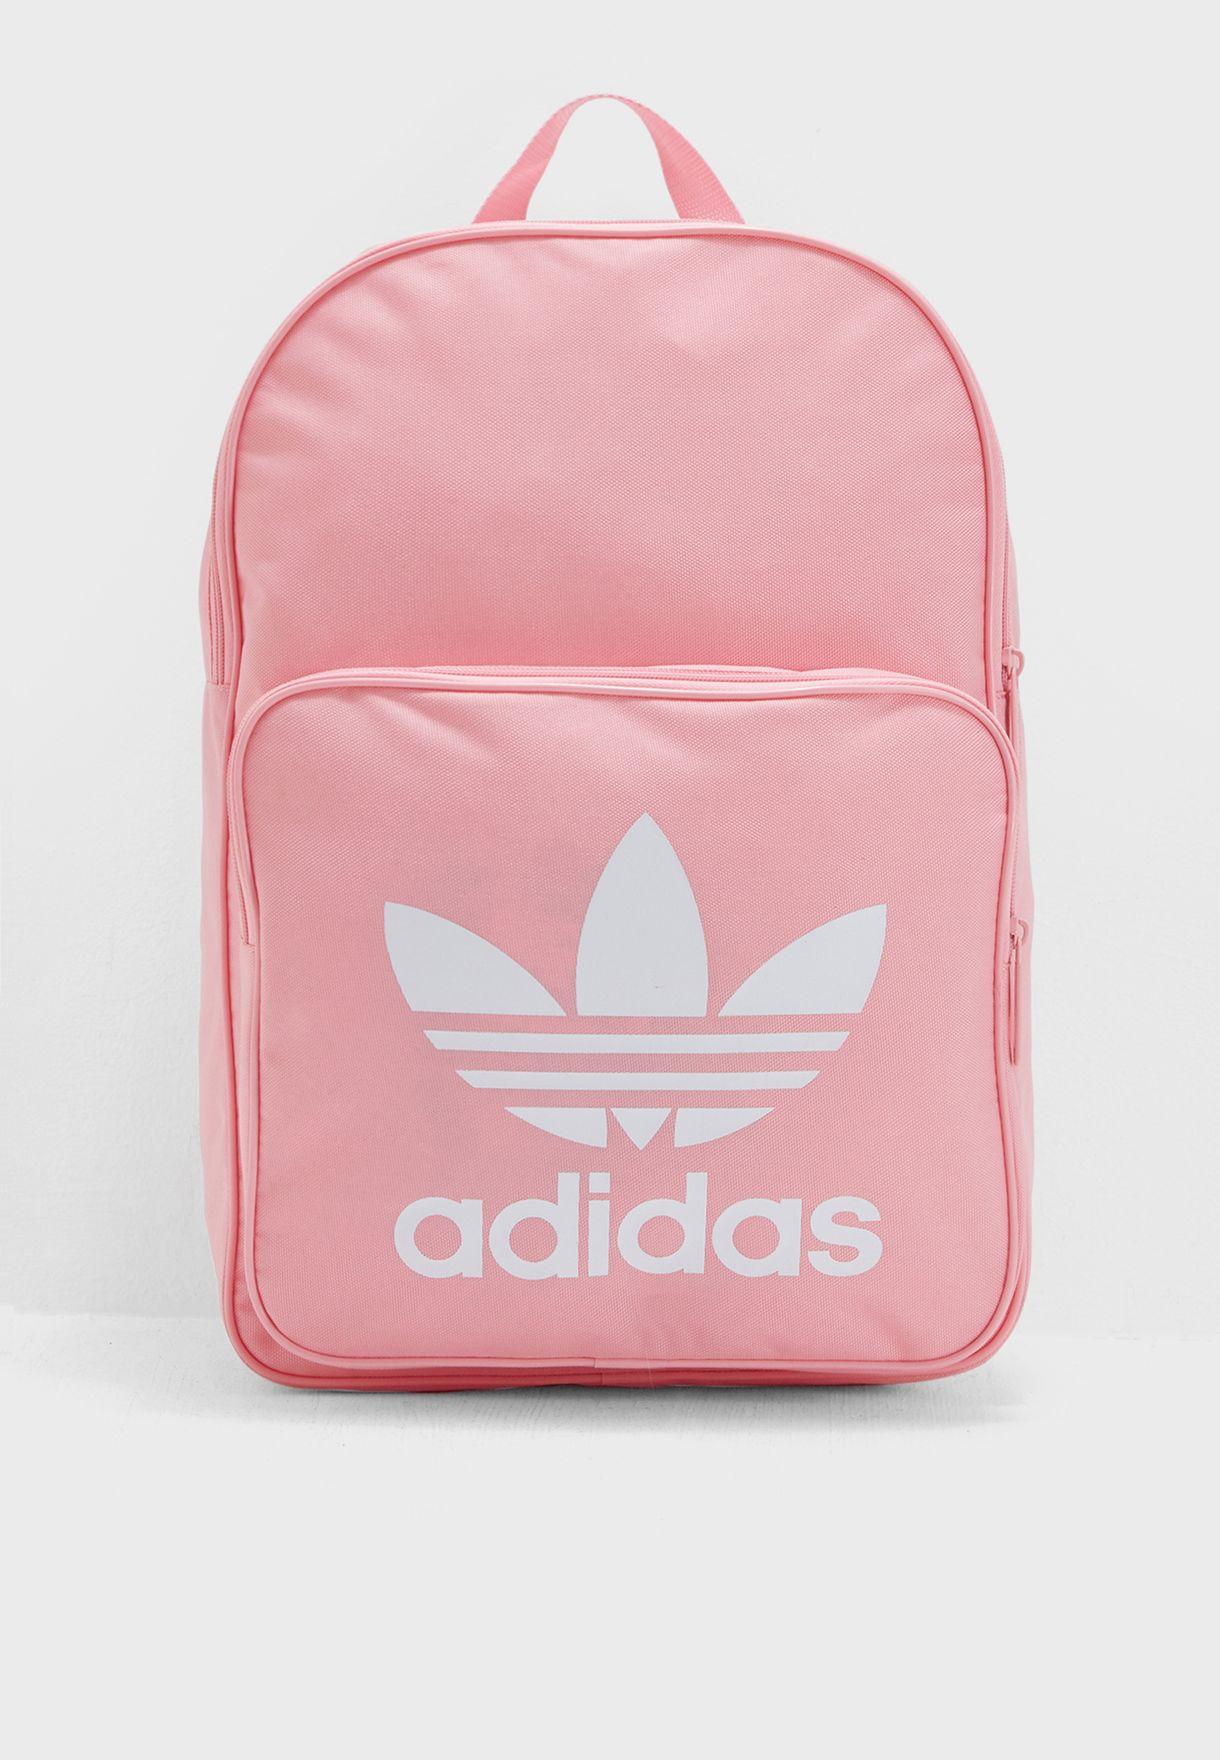 3bf8771d11ba Shop adidas Originals pink Classic Trefoil Backpack DJ2173 for Women ...